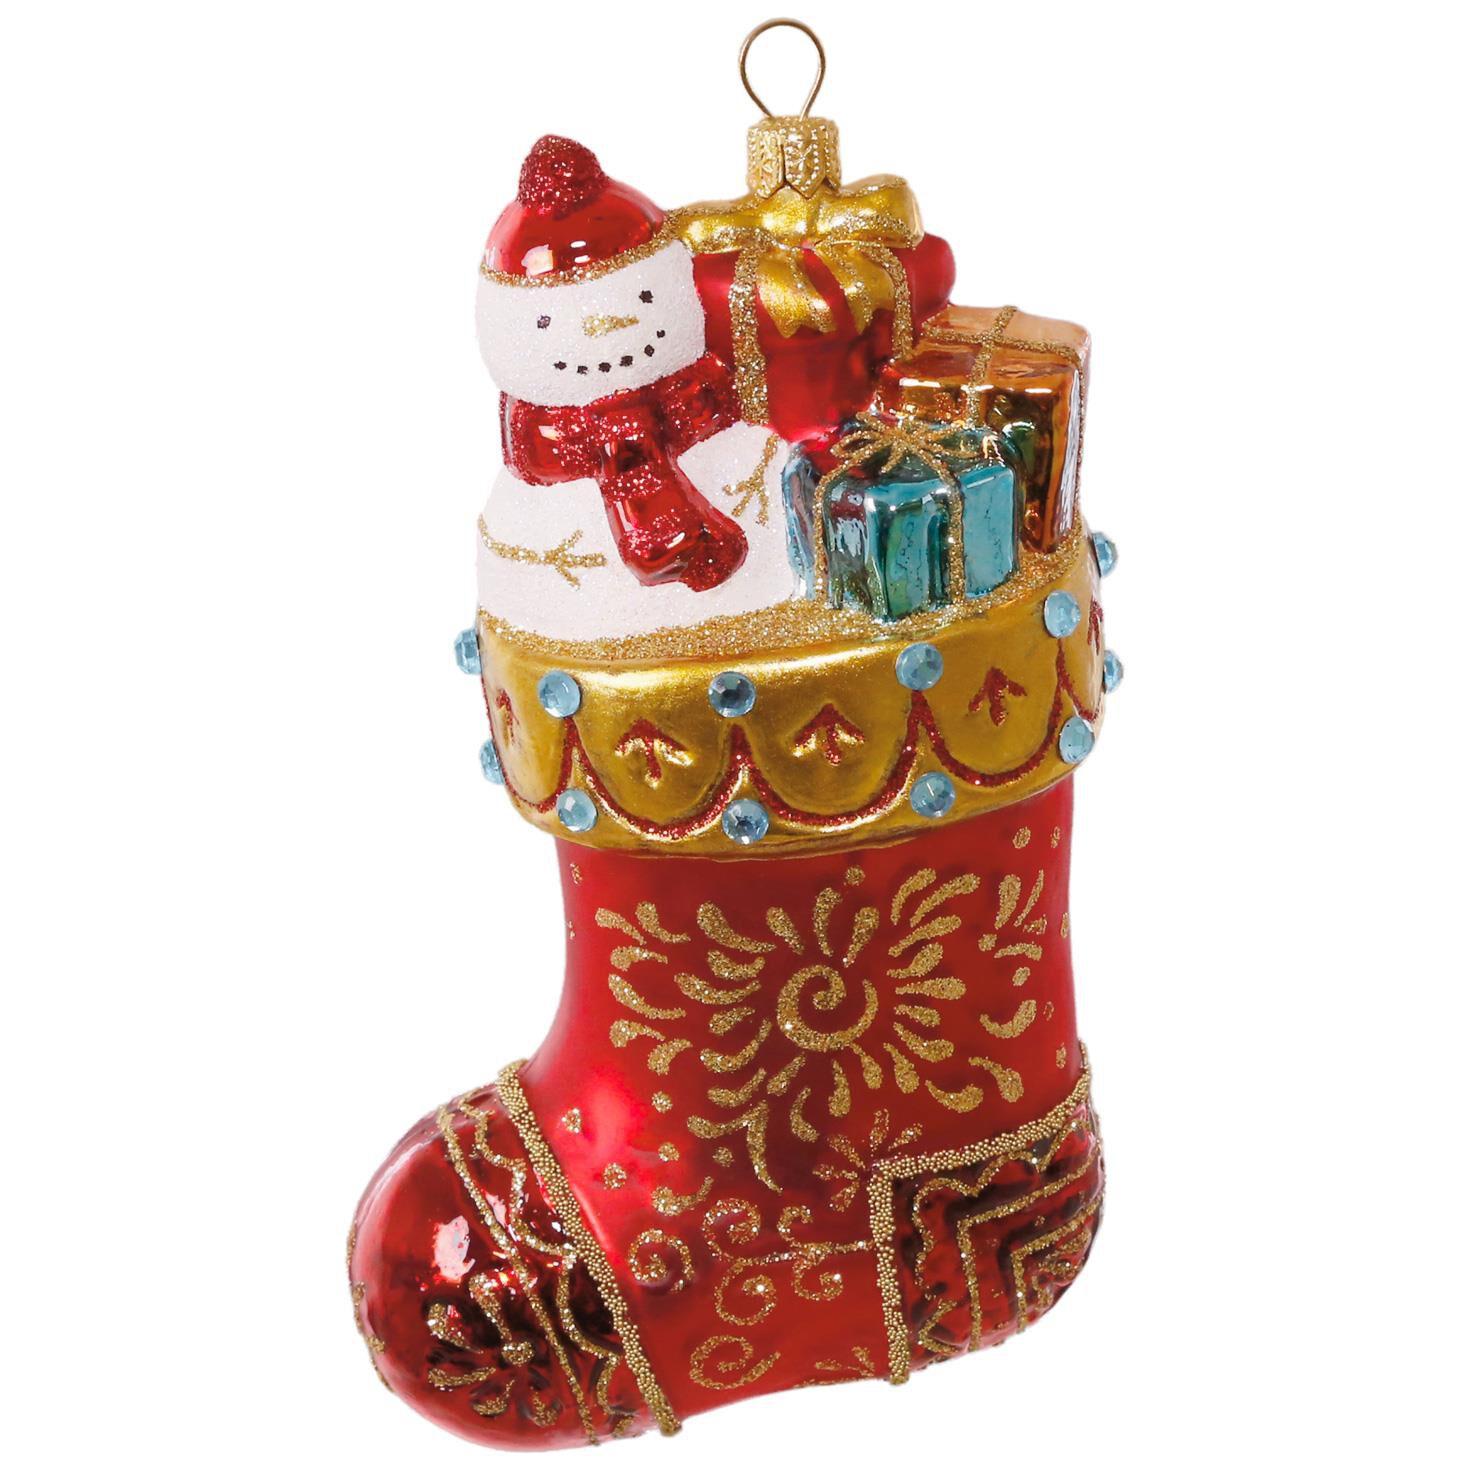 Christmas Stocking Blown Glass Ornament  Specialty Ornaments  Hallmark